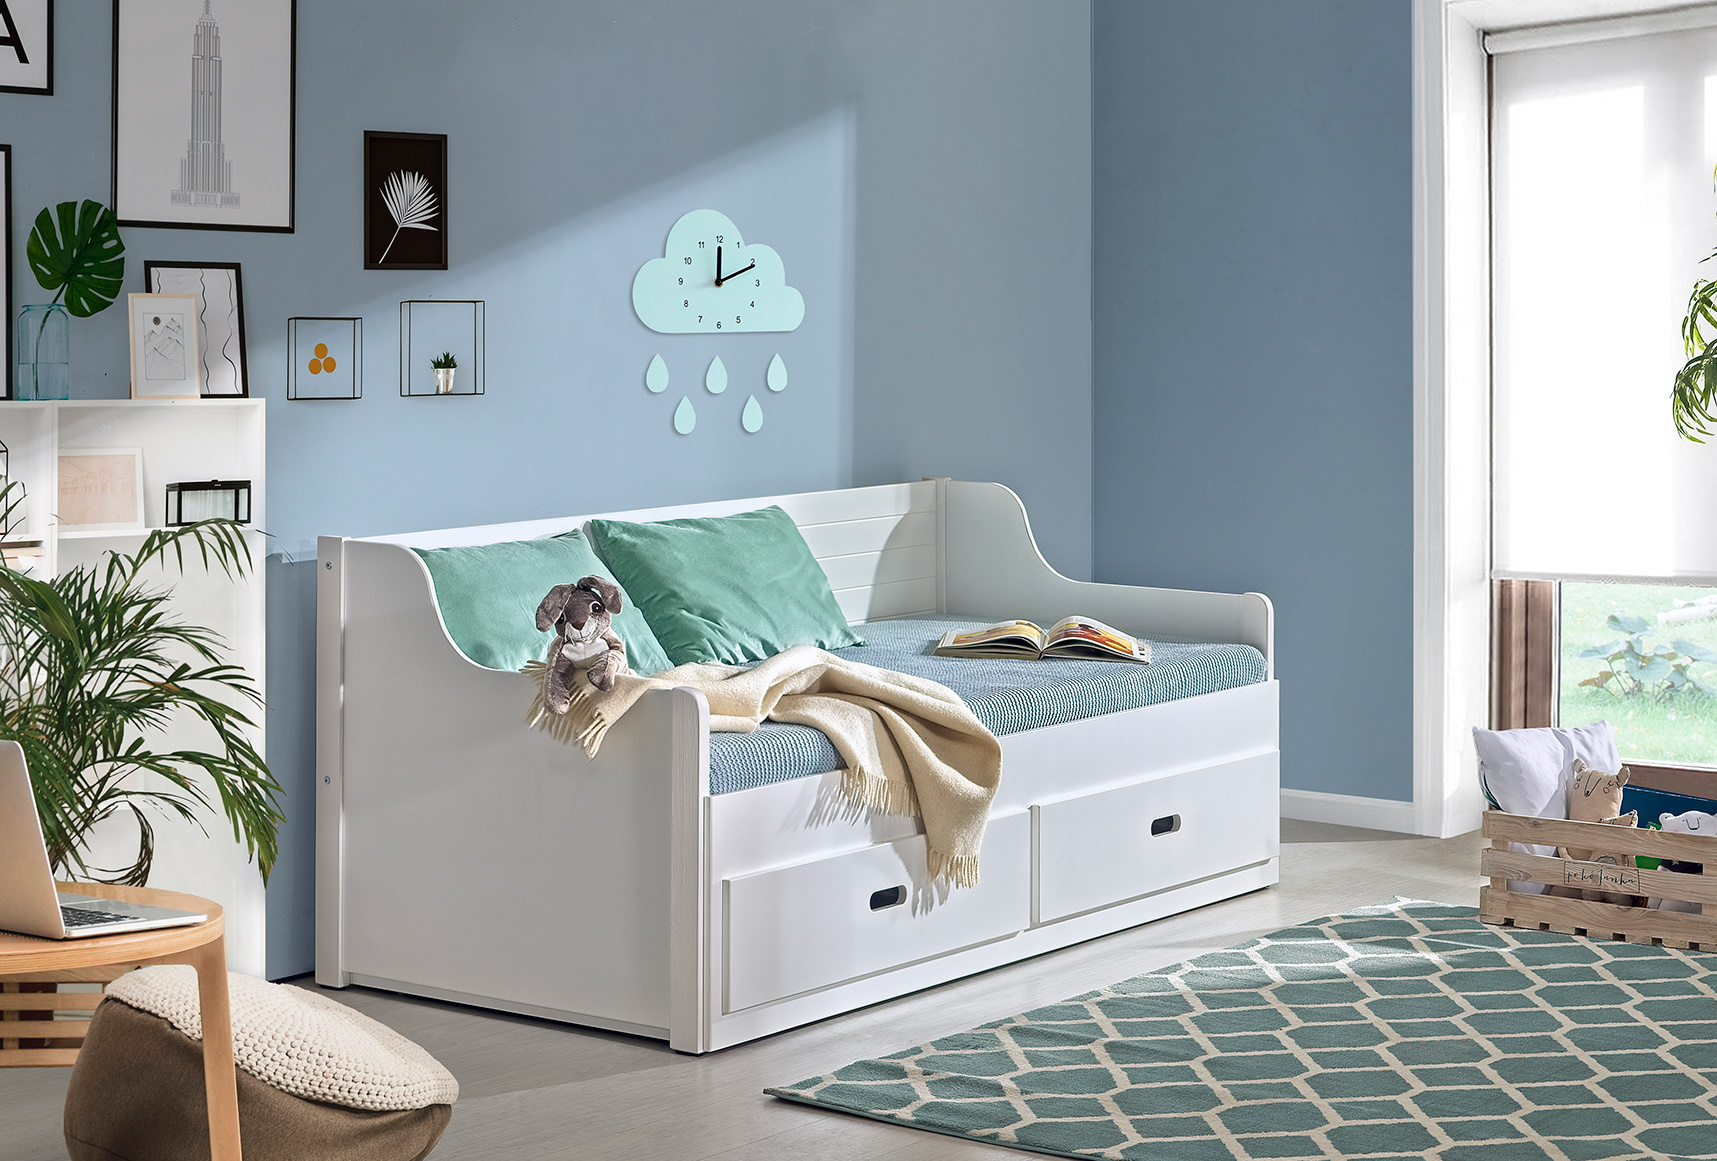 Dolmar Rozkládací postel Šimon s úložným prostorem